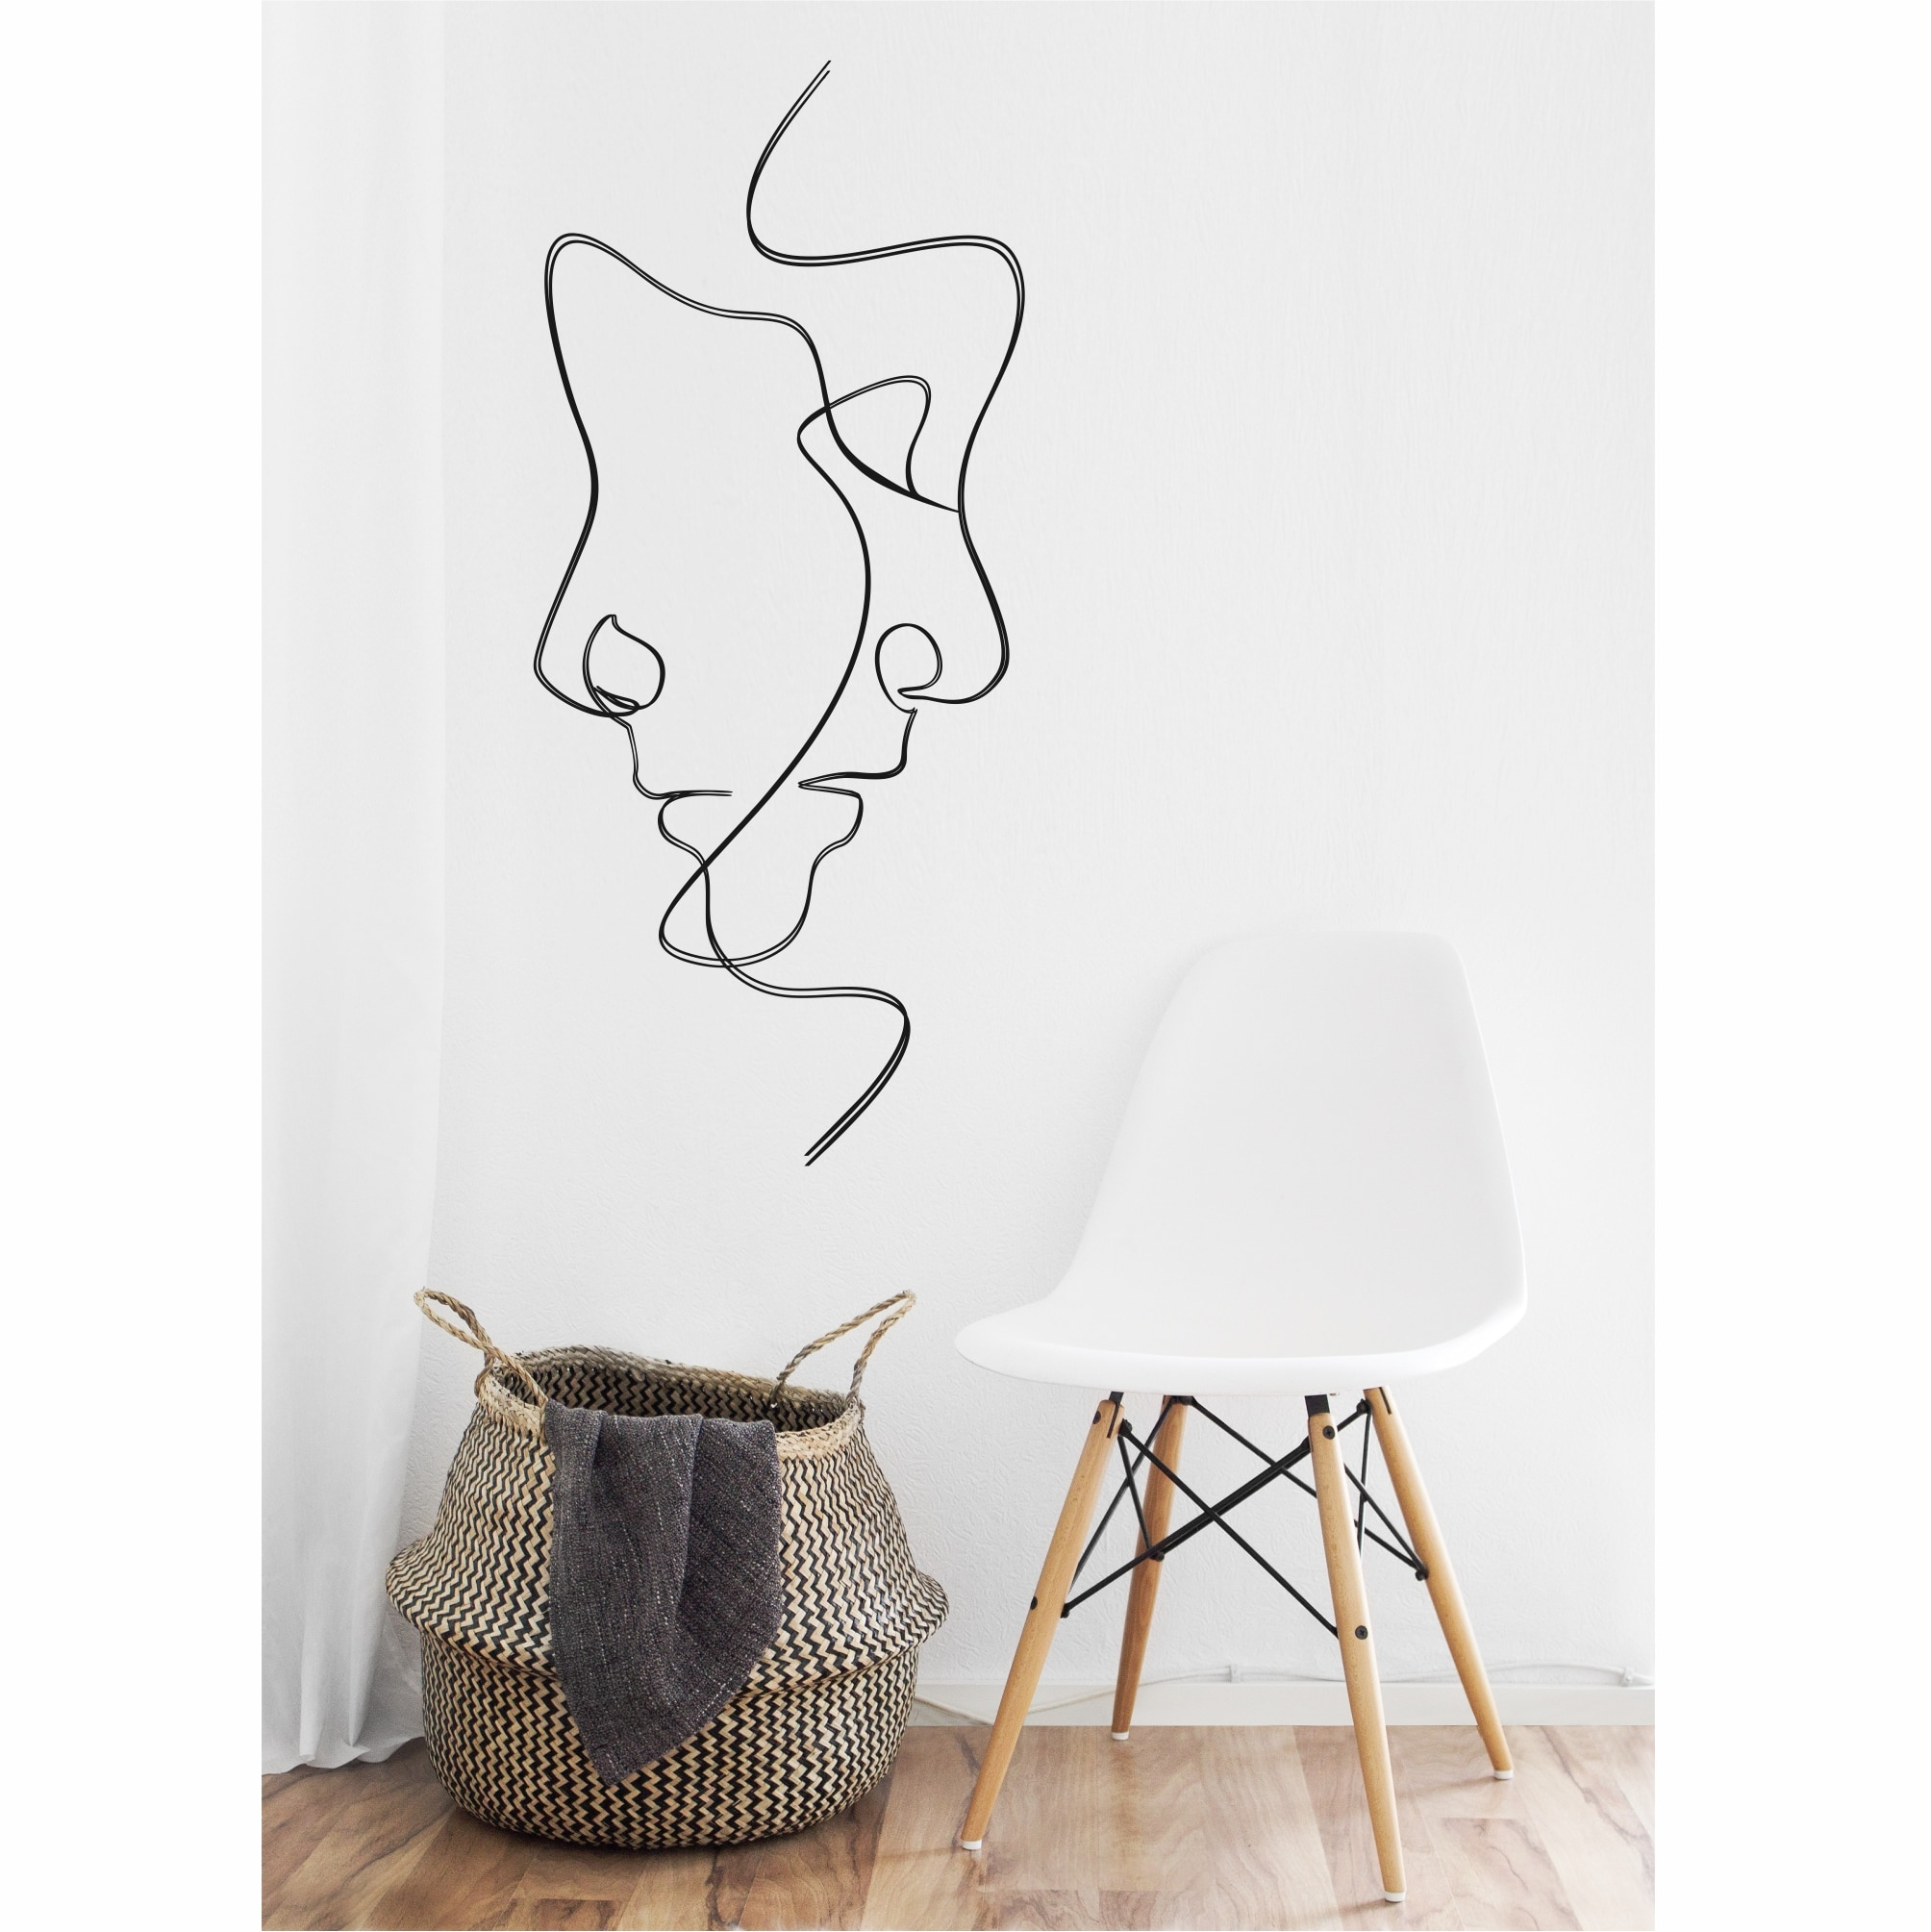 Arte de pared de Metal, arte de pared de línea, arte de pared de Metal, decoración de interiores, colgantes de pared, arte de pared de Metal, arte minimalista, 2 caras